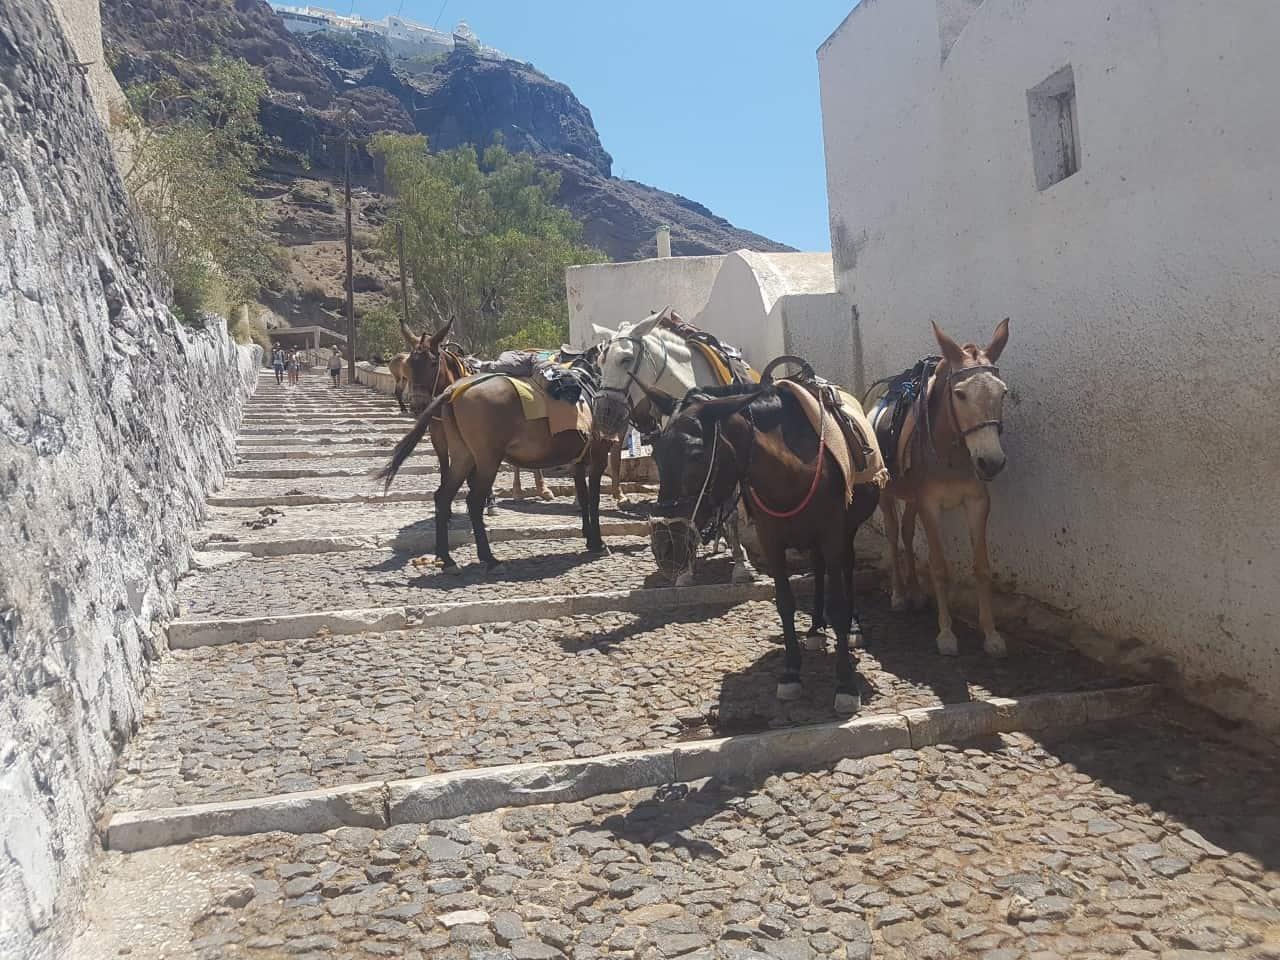 Eγκύκλιος του υπουργείου για την προστασία των ιπποειδών εργασίας